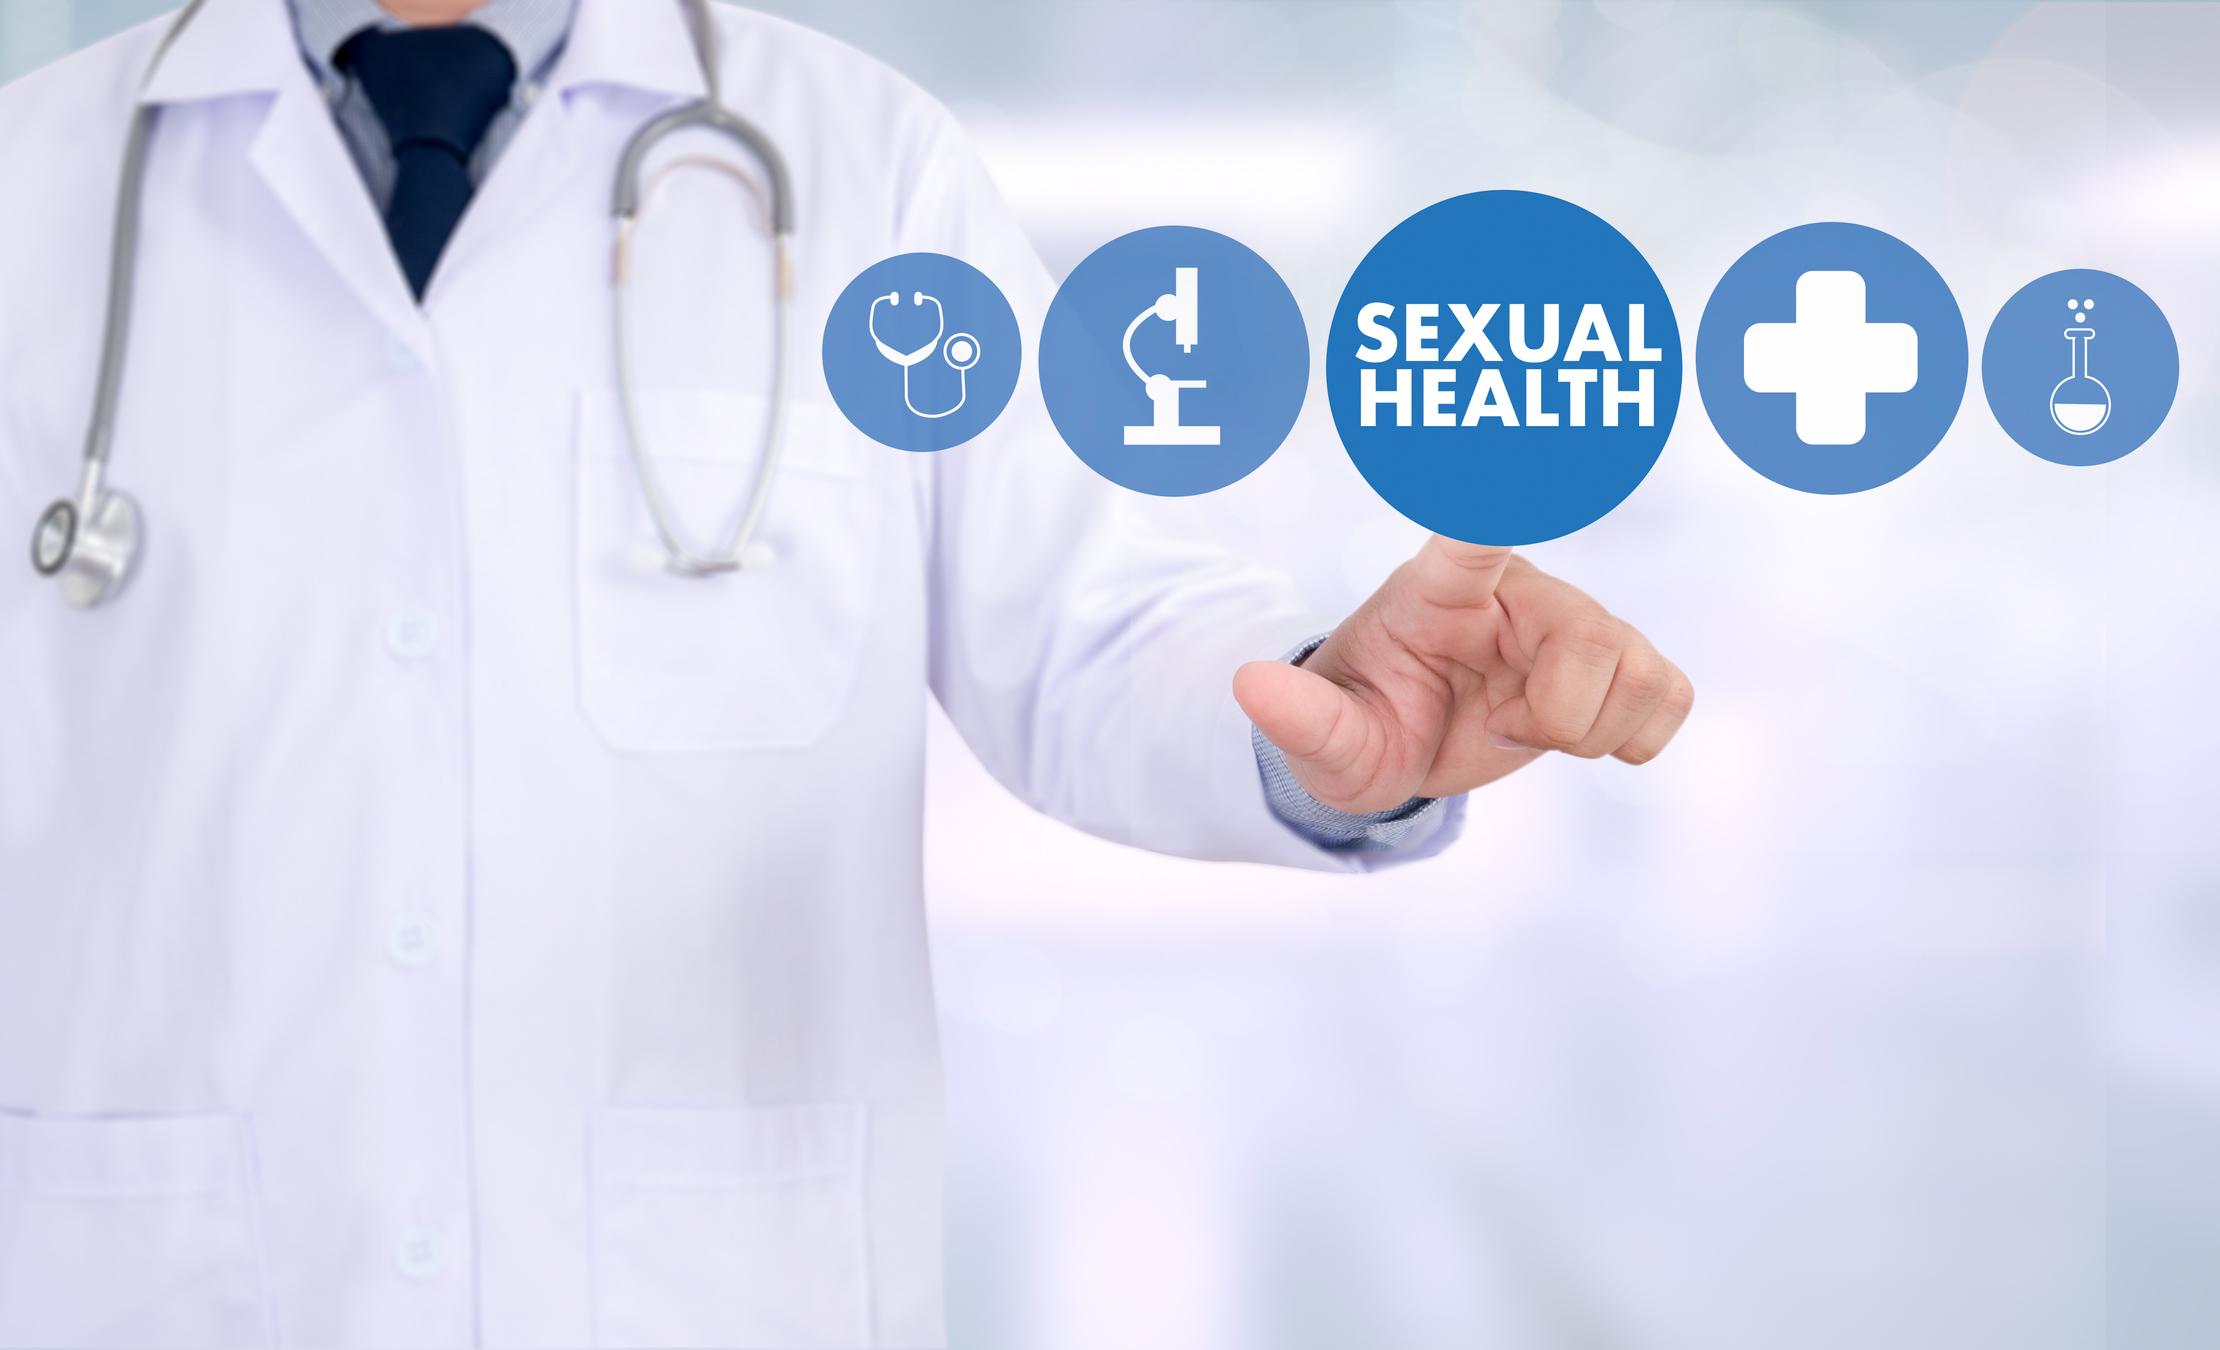 For growing STI crisis, HIV, HCV and Pov …